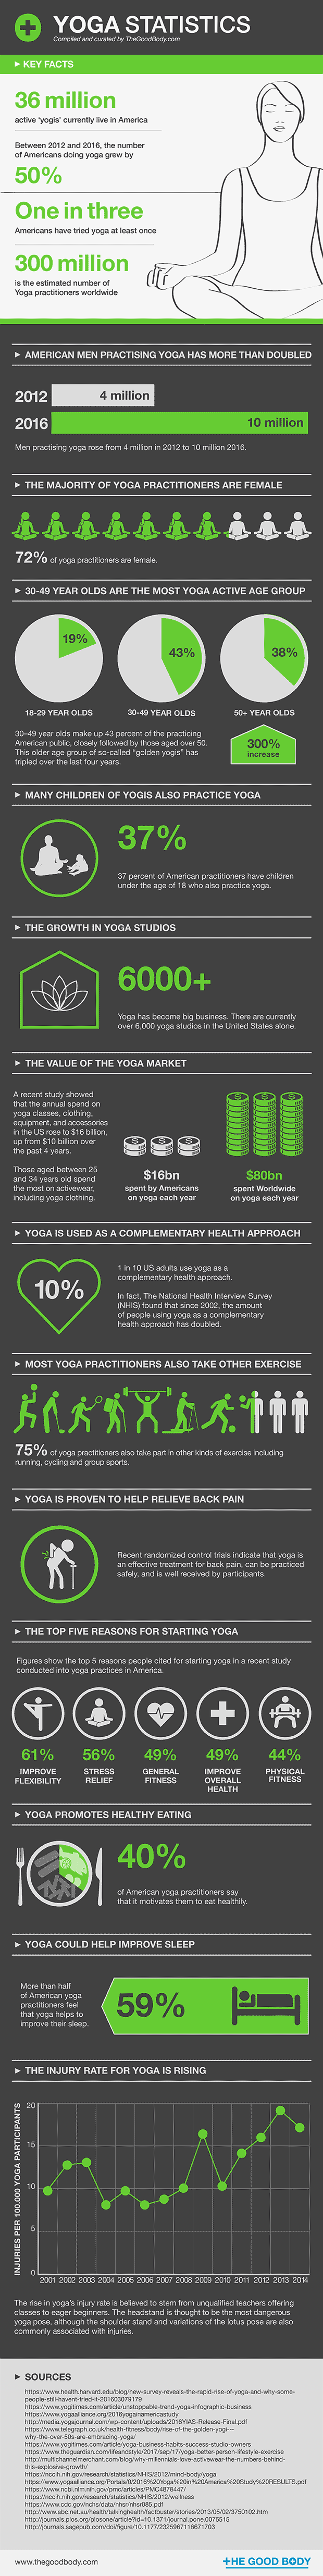 Yoga Statistics – infographic